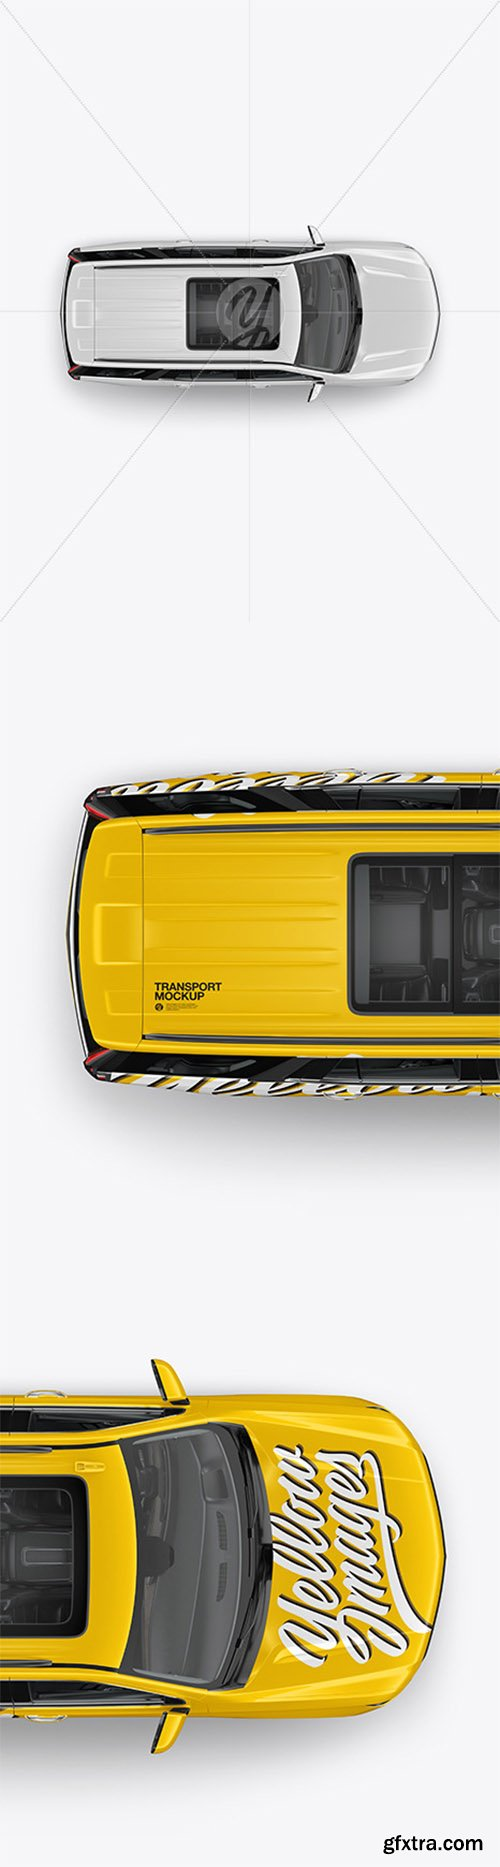 Luxury SUV Mockup - Top View 65932